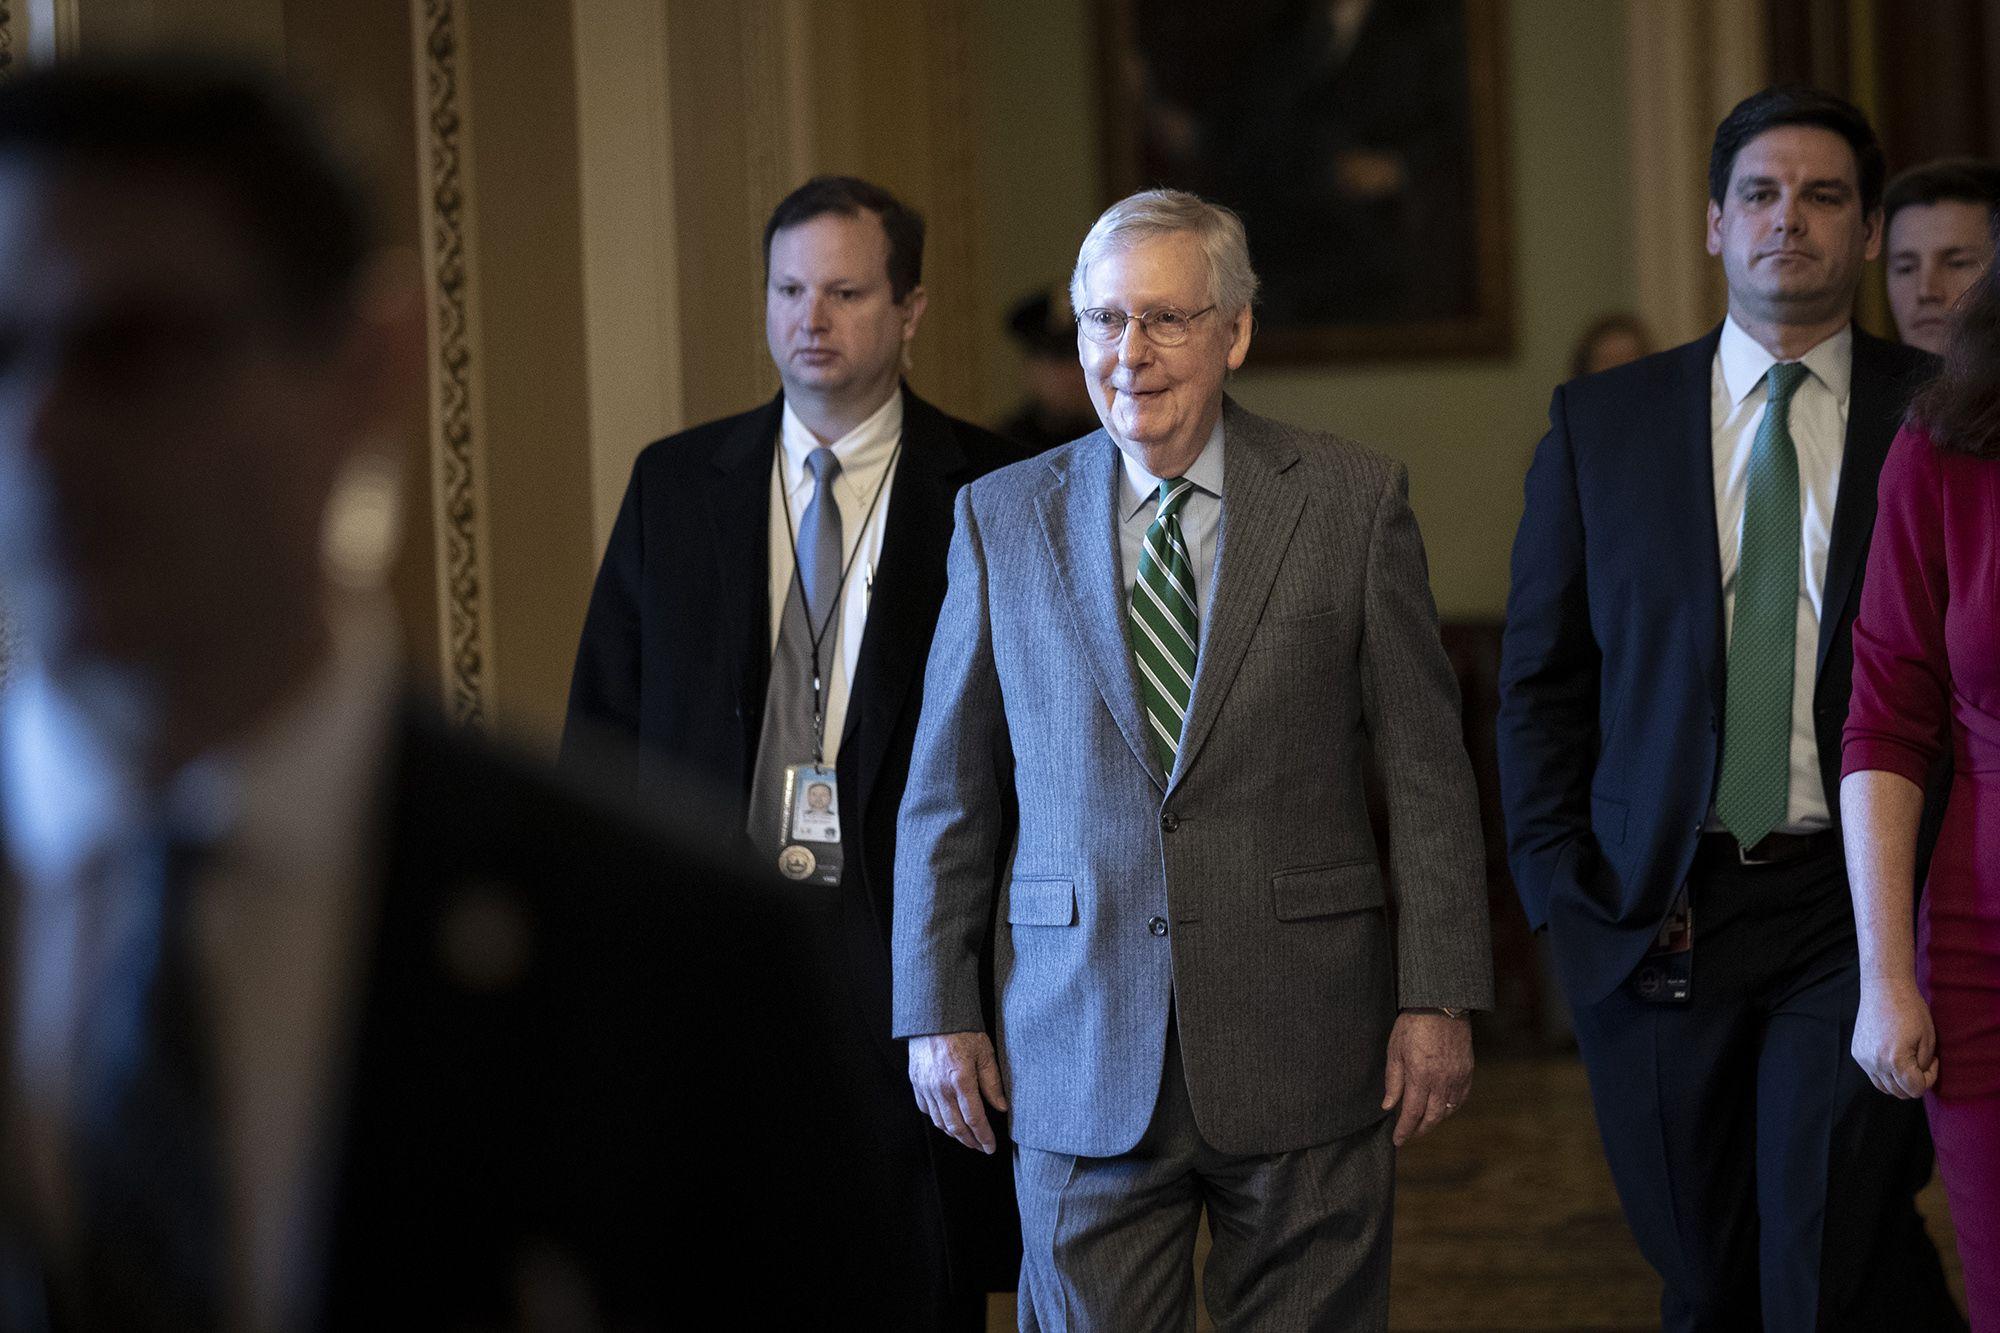 Senate Passes USMCA, Giving Trump a Win Before Impeachment Trial